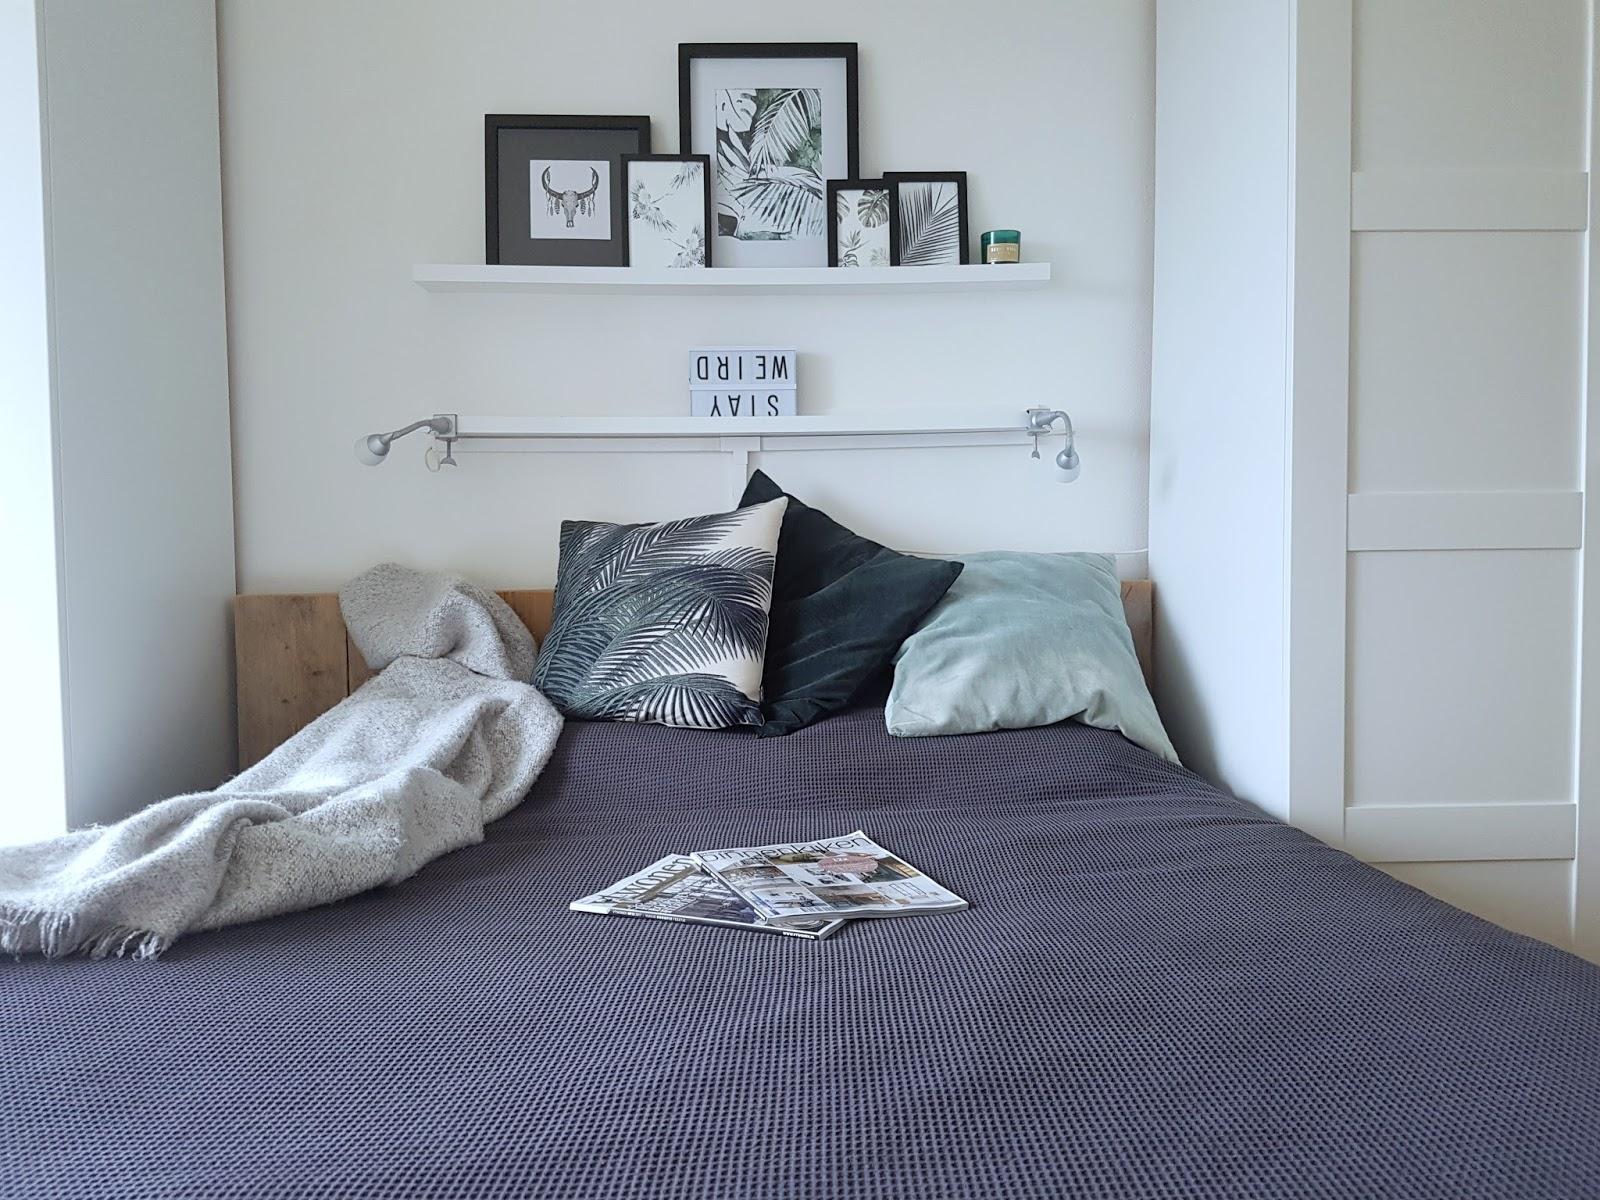 Quotes Voor Slaapkamer : Rosa fashion sports mini make over slaapkamer